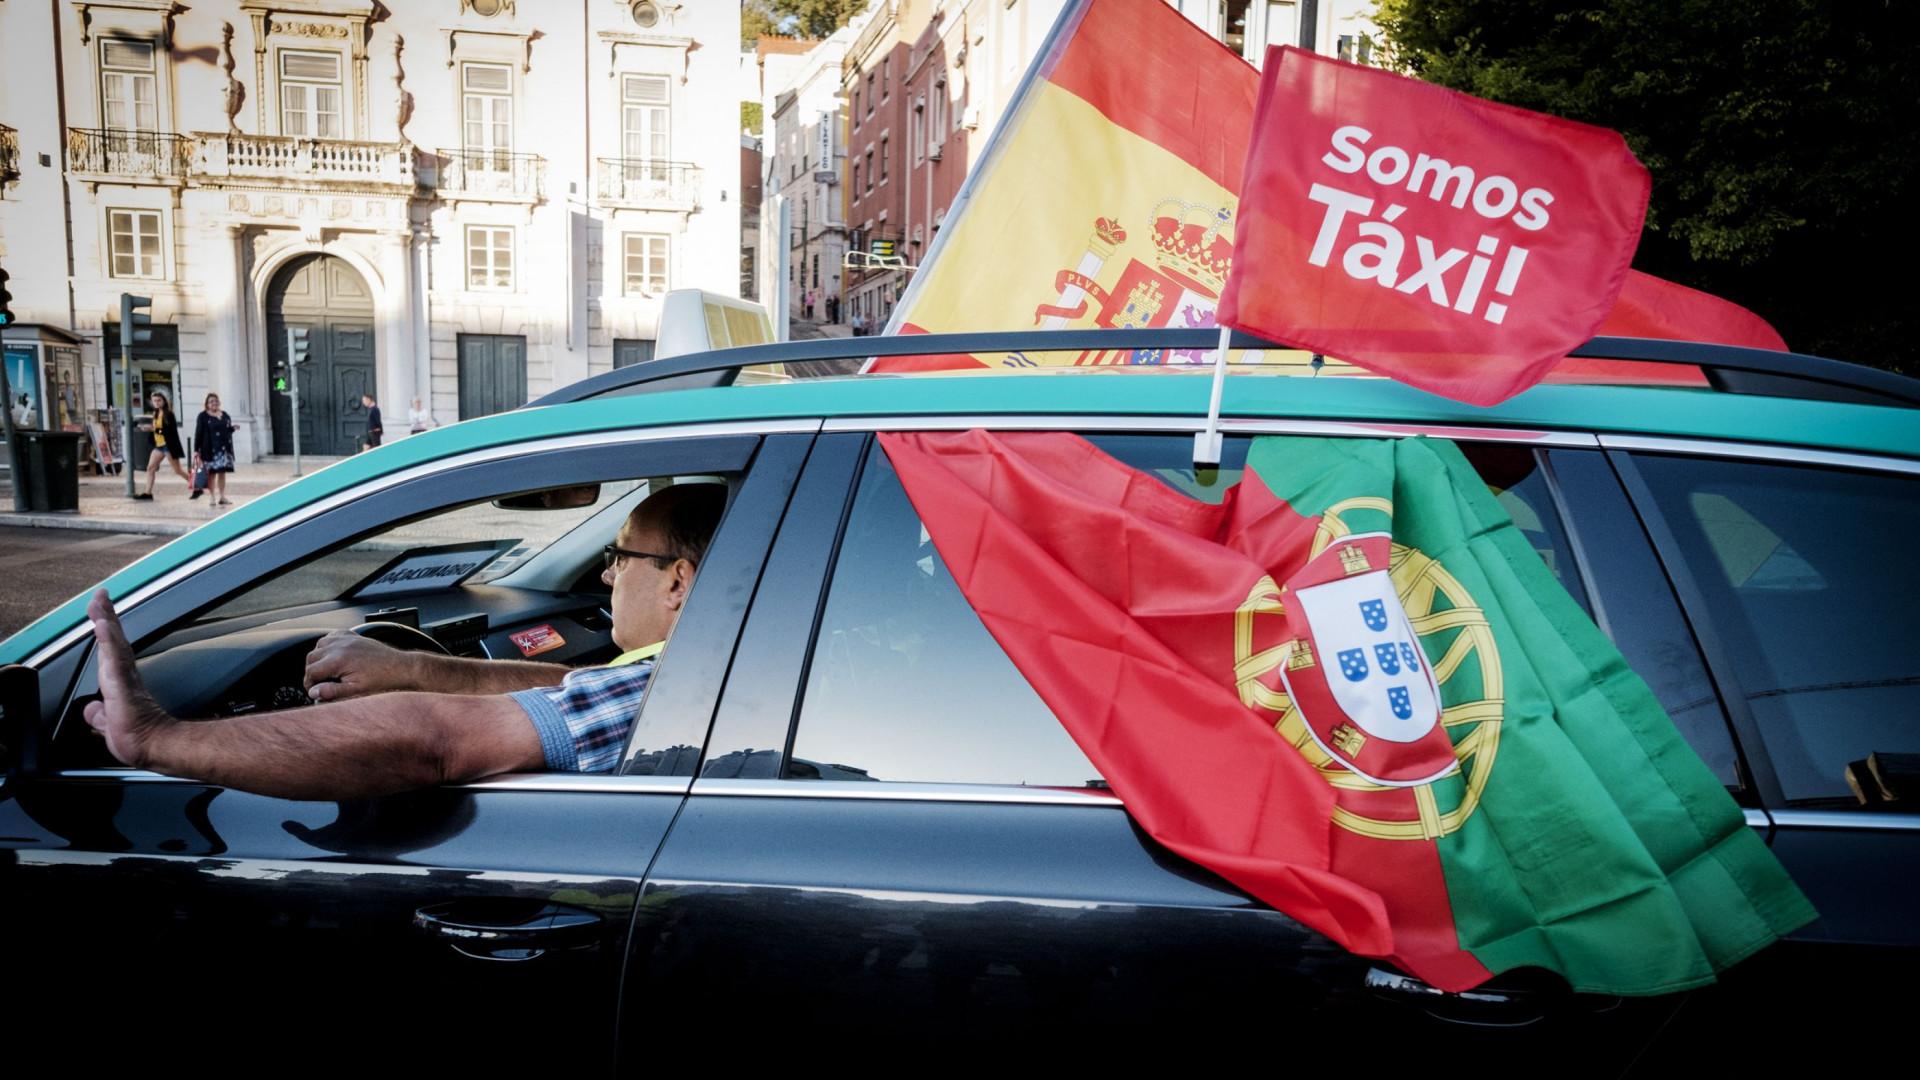 #Somos táxi: Eis as imagens do protesto dos taxistas que saíram às ruas